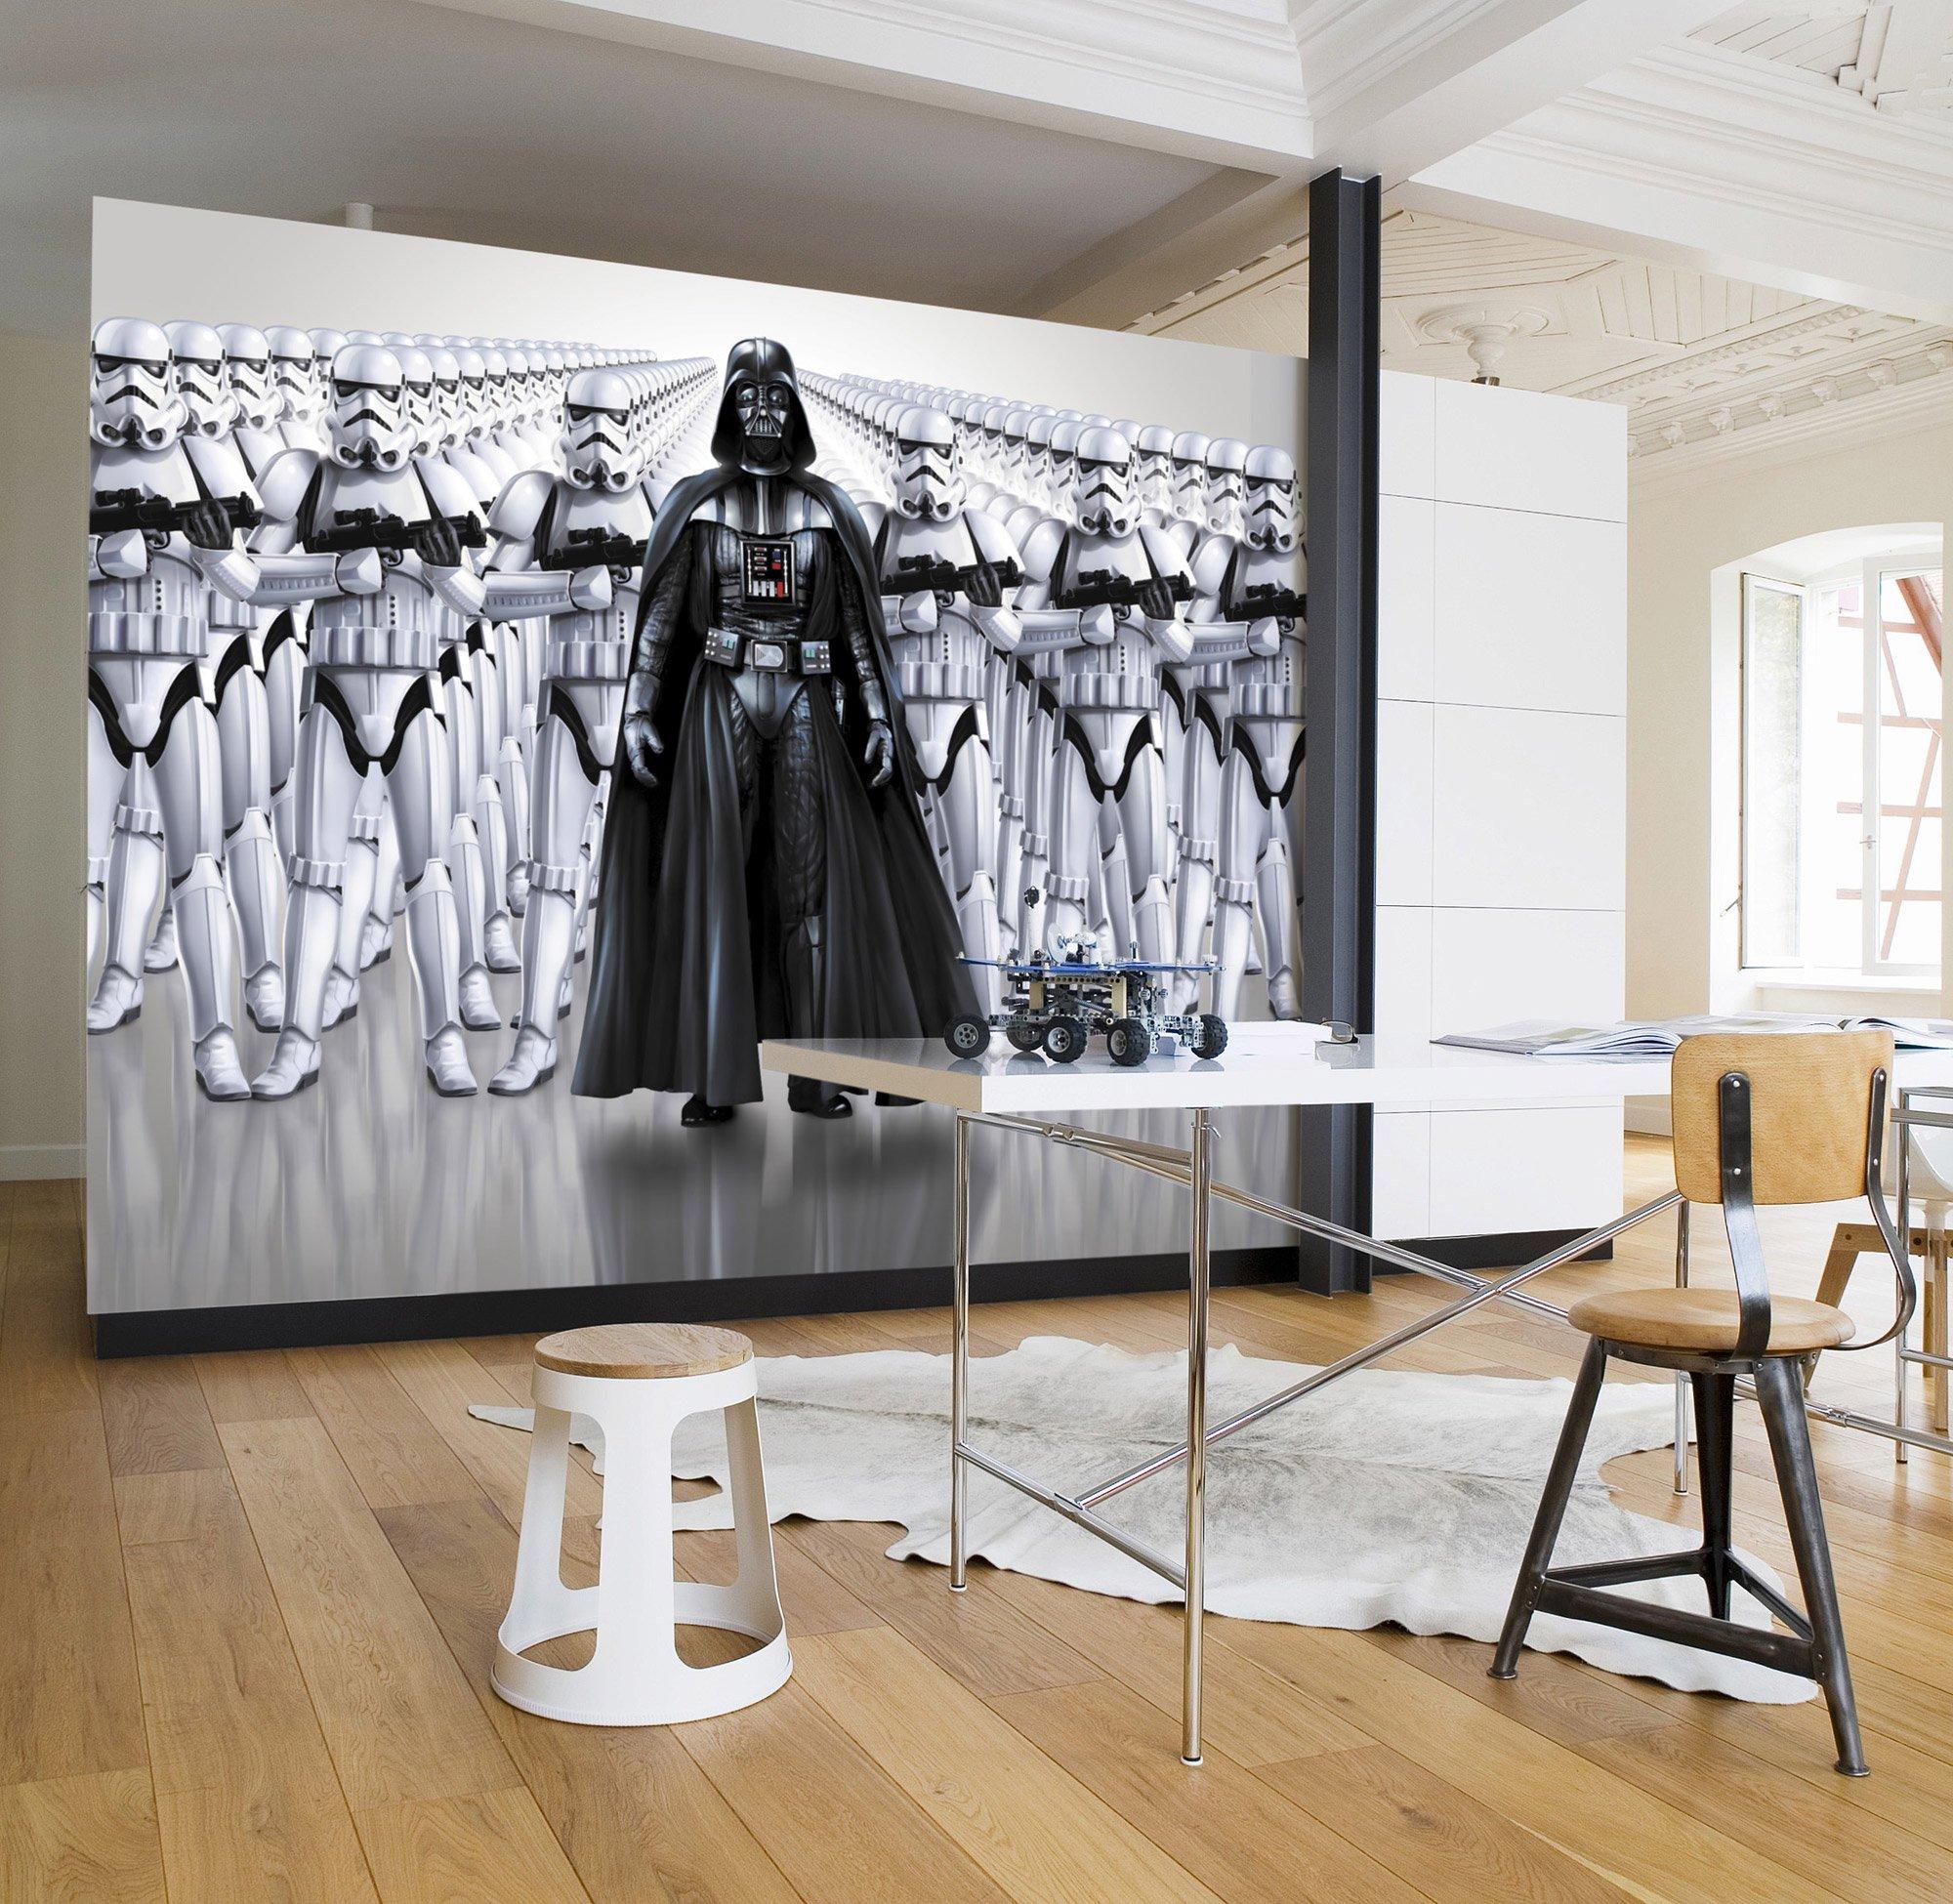 Komar Star Wars Imperial Force Darth Vader Stormtrooper Wallpaper Mural Vinyl Black White 368x0 2x254 Cm Buy Online In China At Desertcart